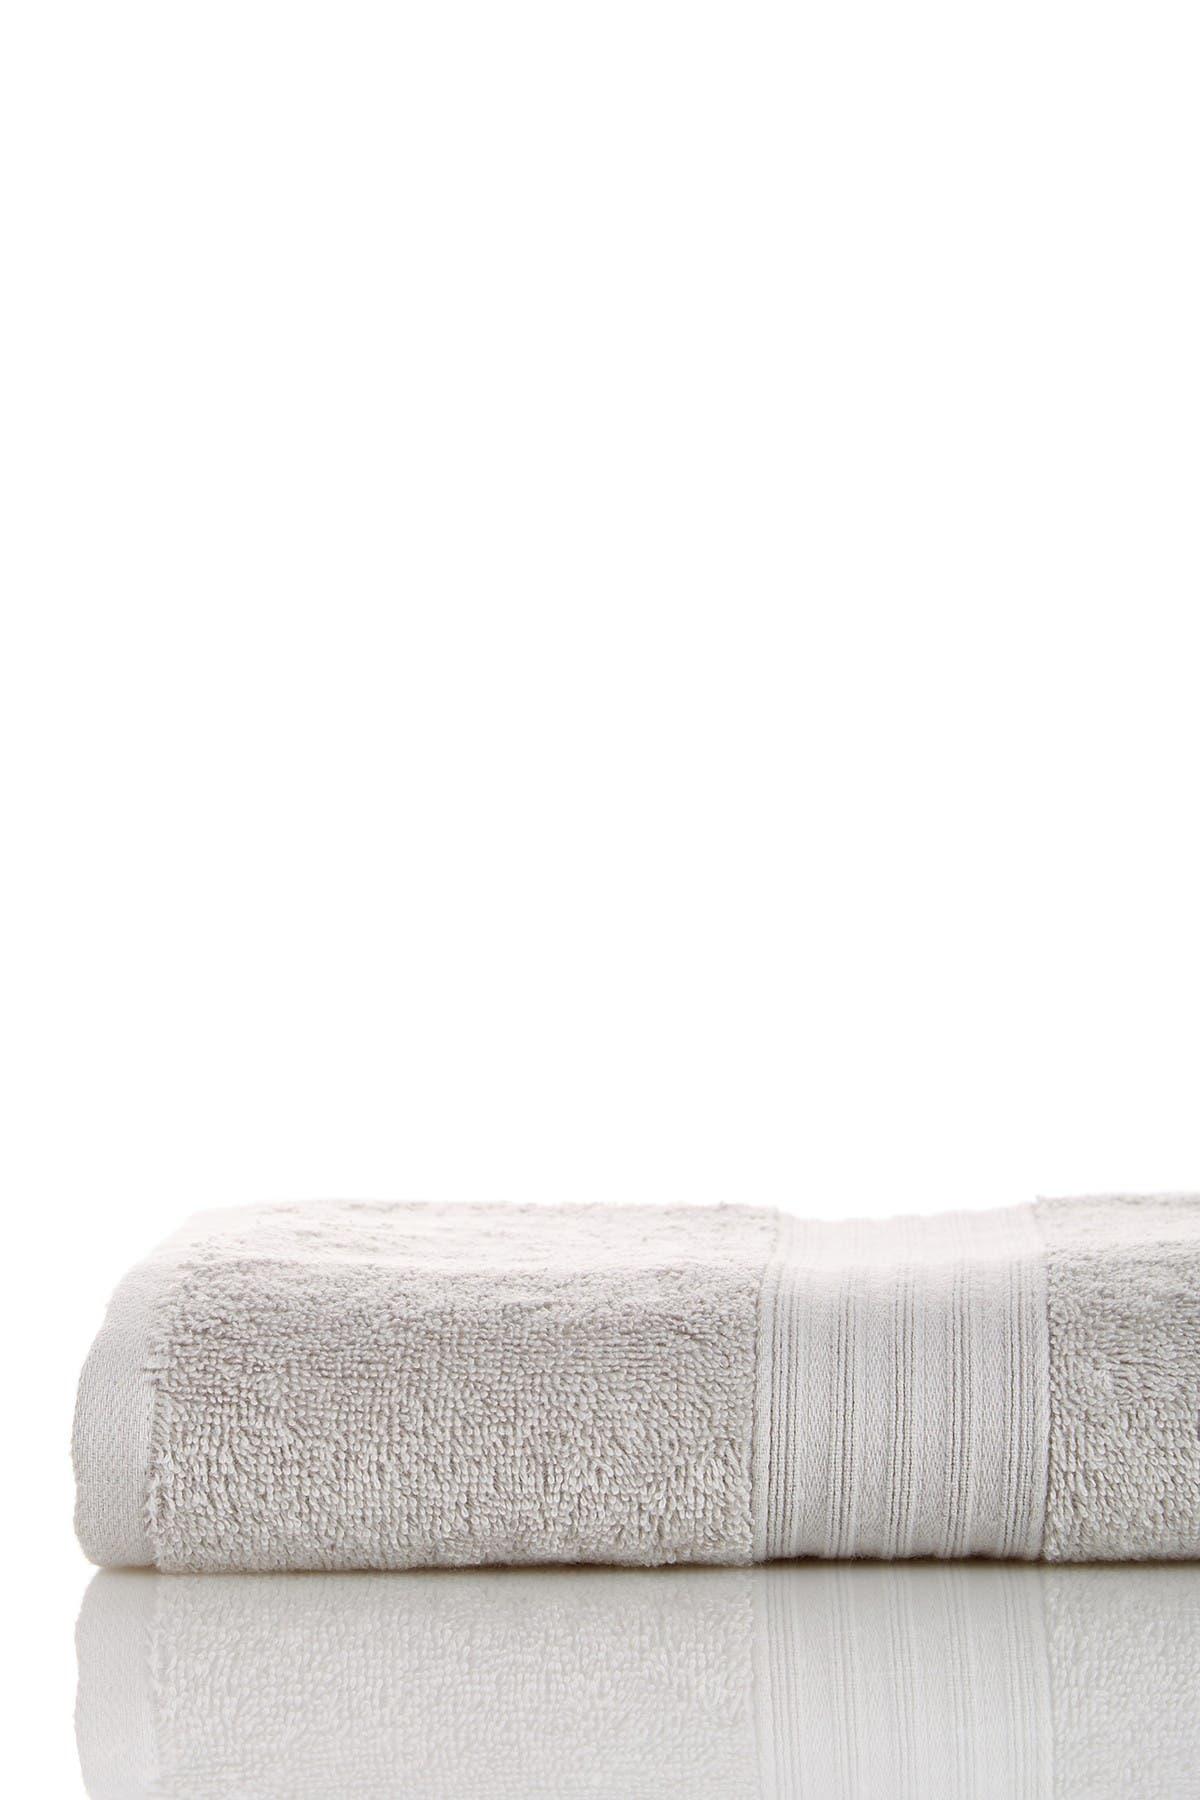 "Image of Nordstrom Rack 500 Gram Cotton Terry Bath Towel - 54"" x 28"""